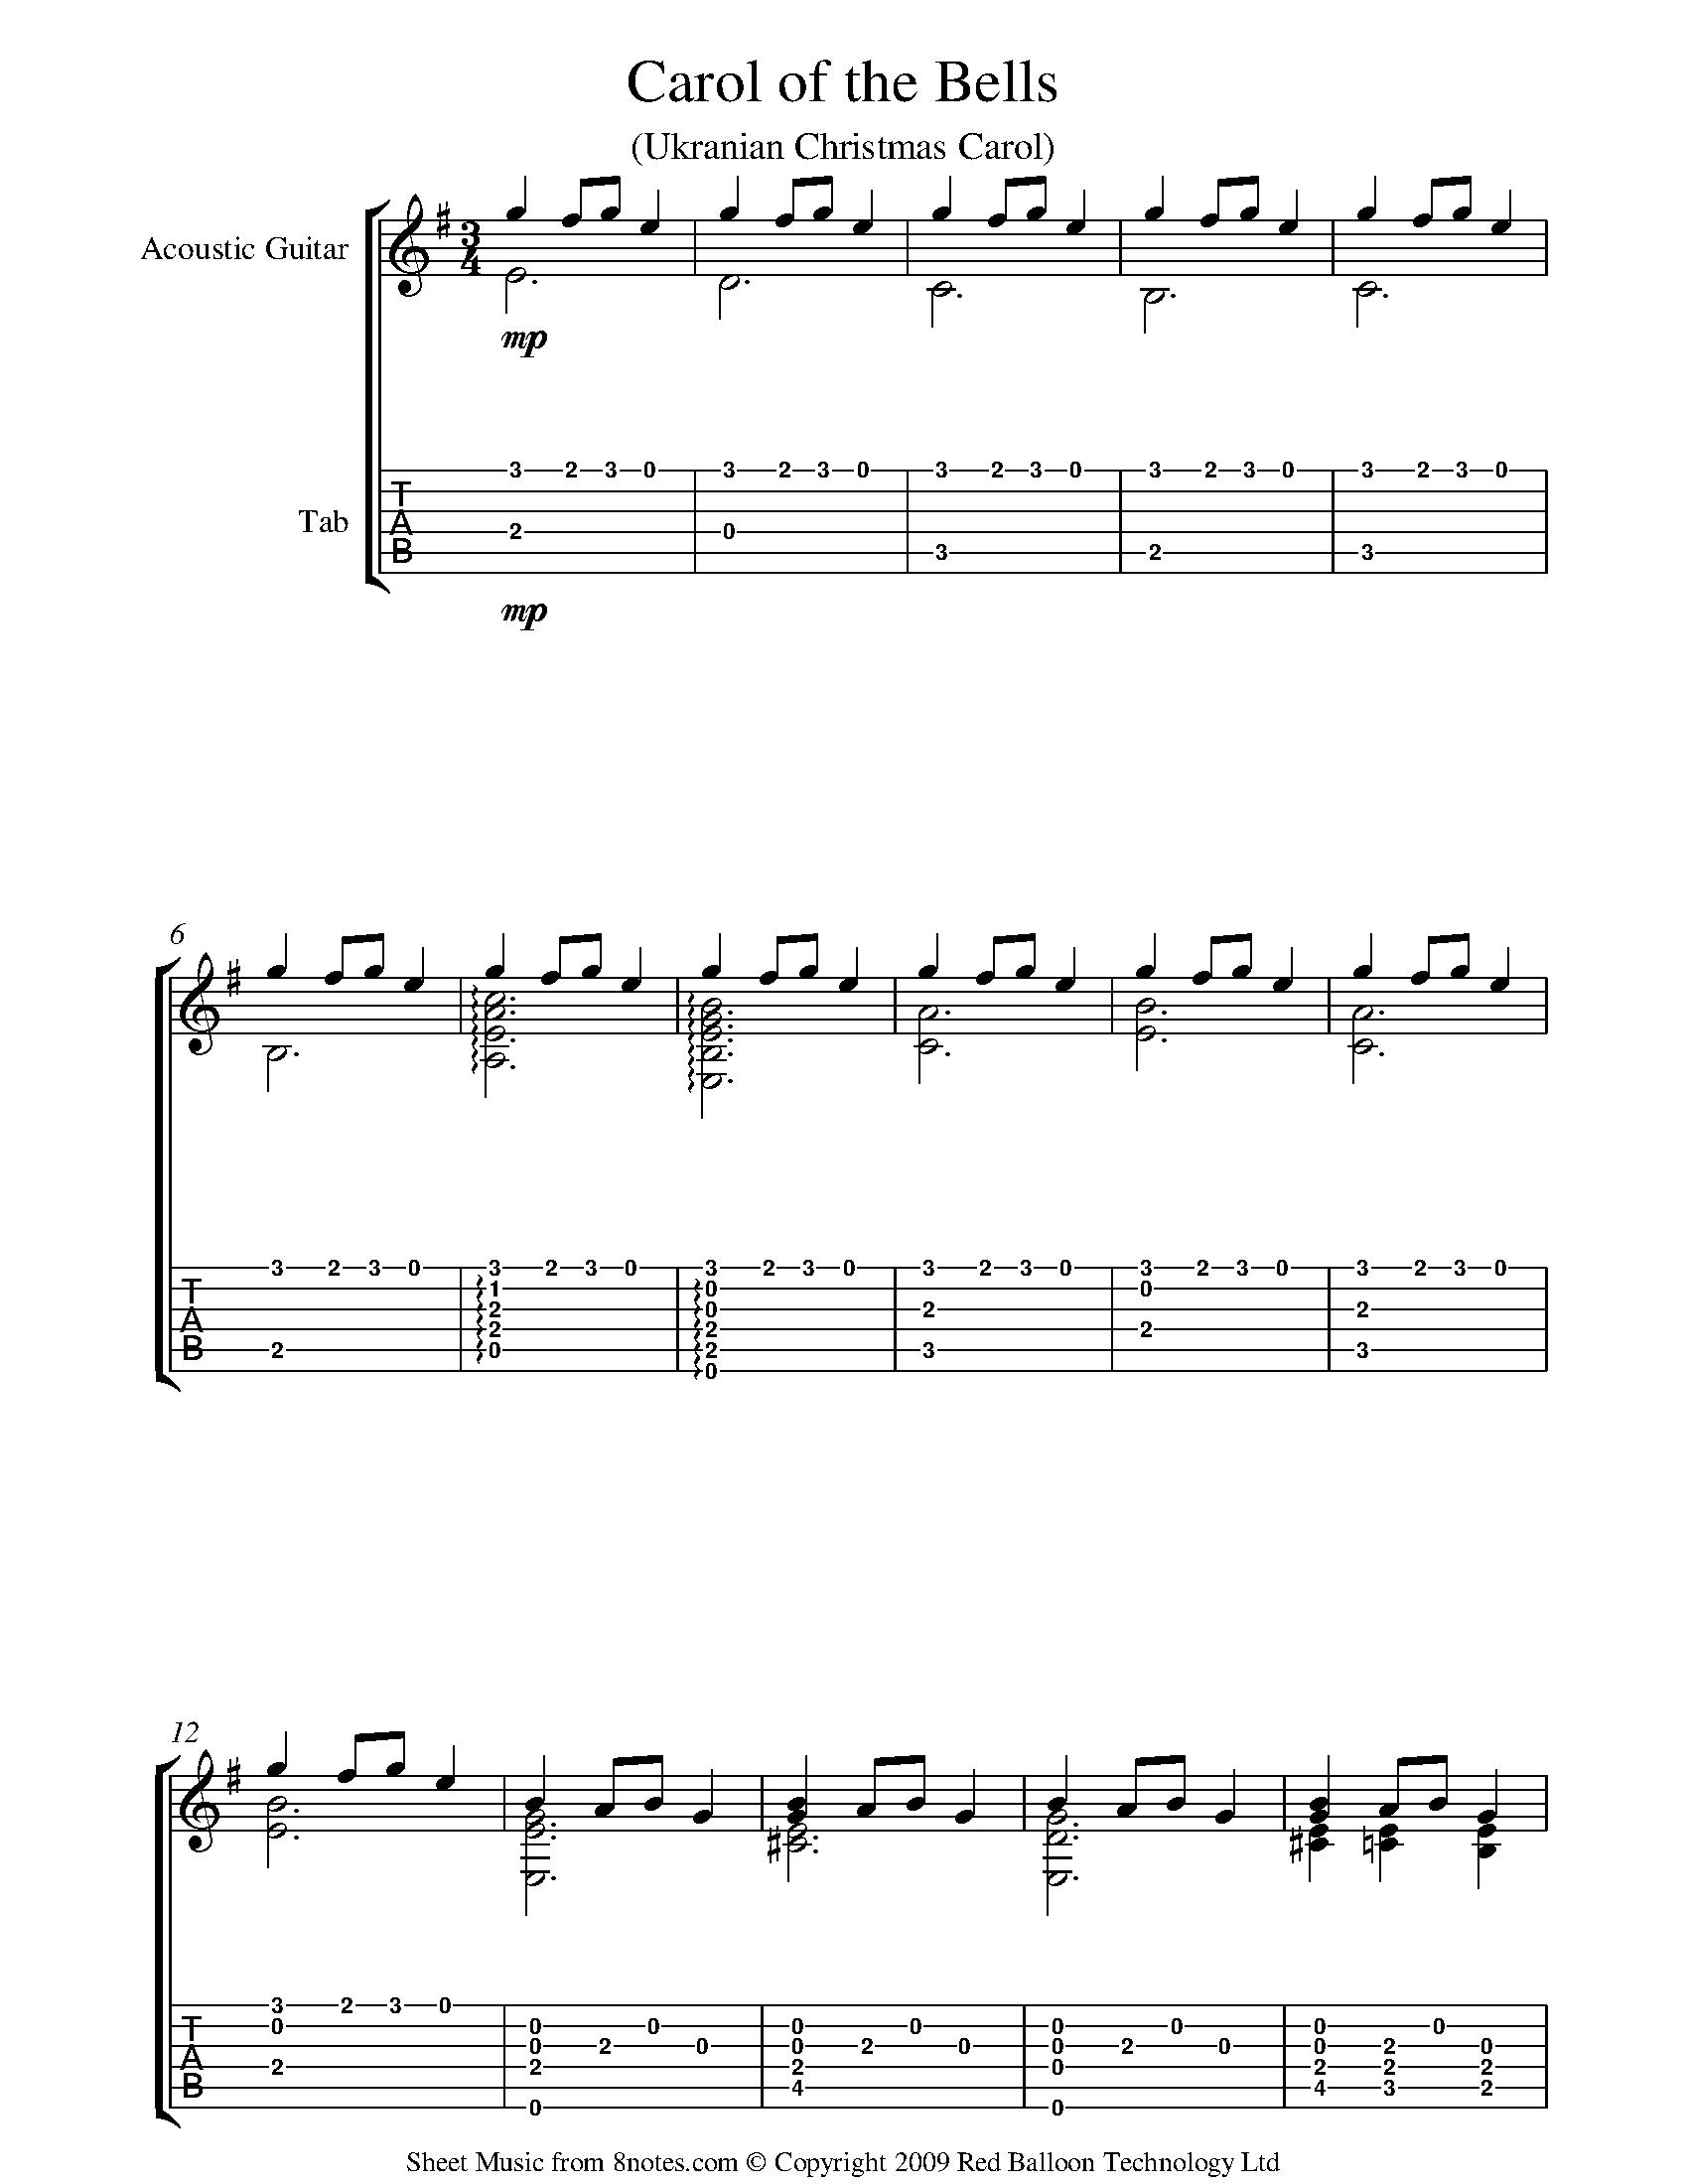 Carol of the bells Sheet music for Guitar   15notes.com